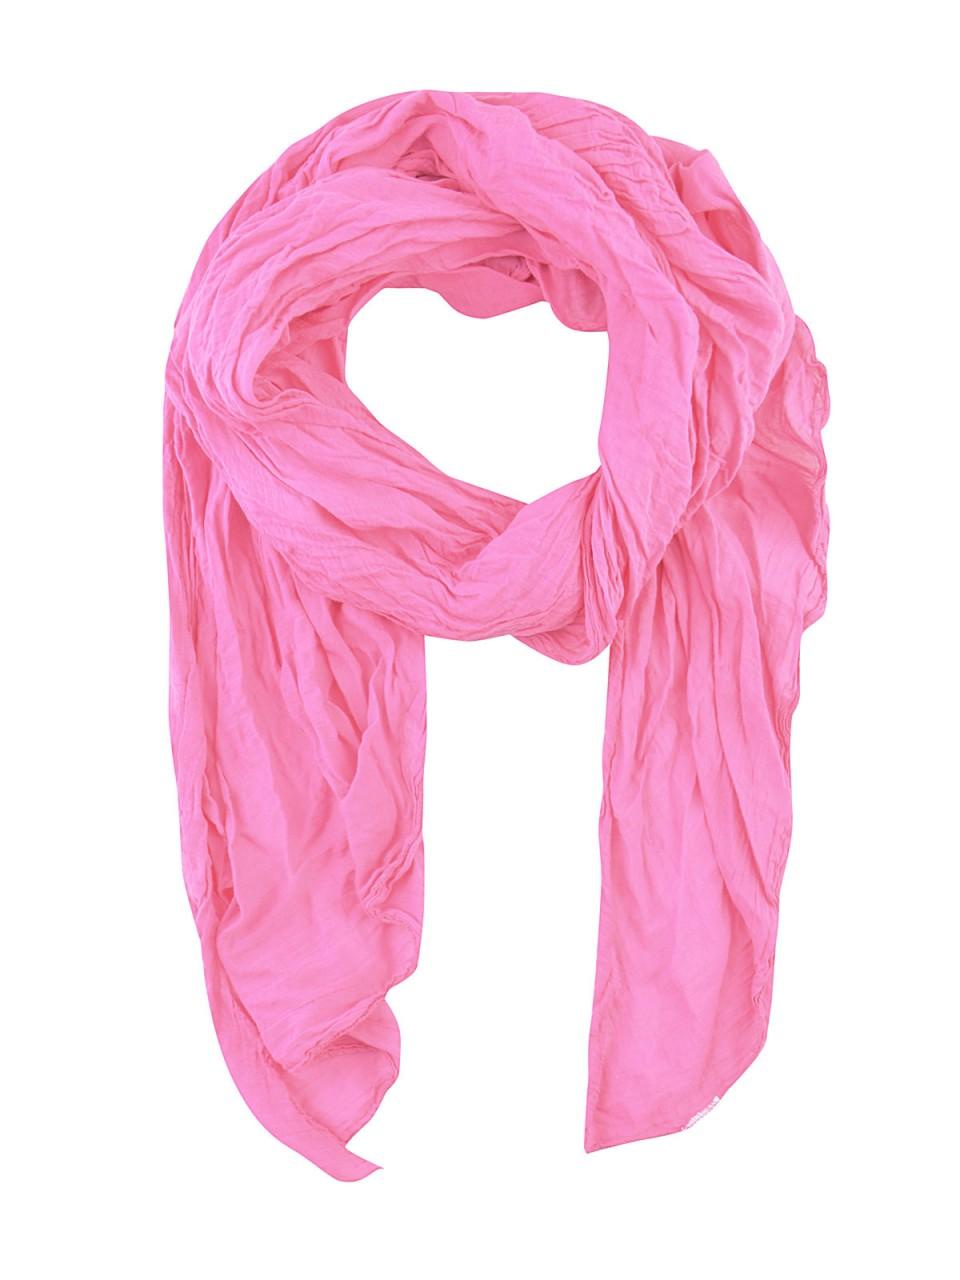 Schals - SMITH SOUL Damen Tuch, pink  - Onlineshop Designermode.com